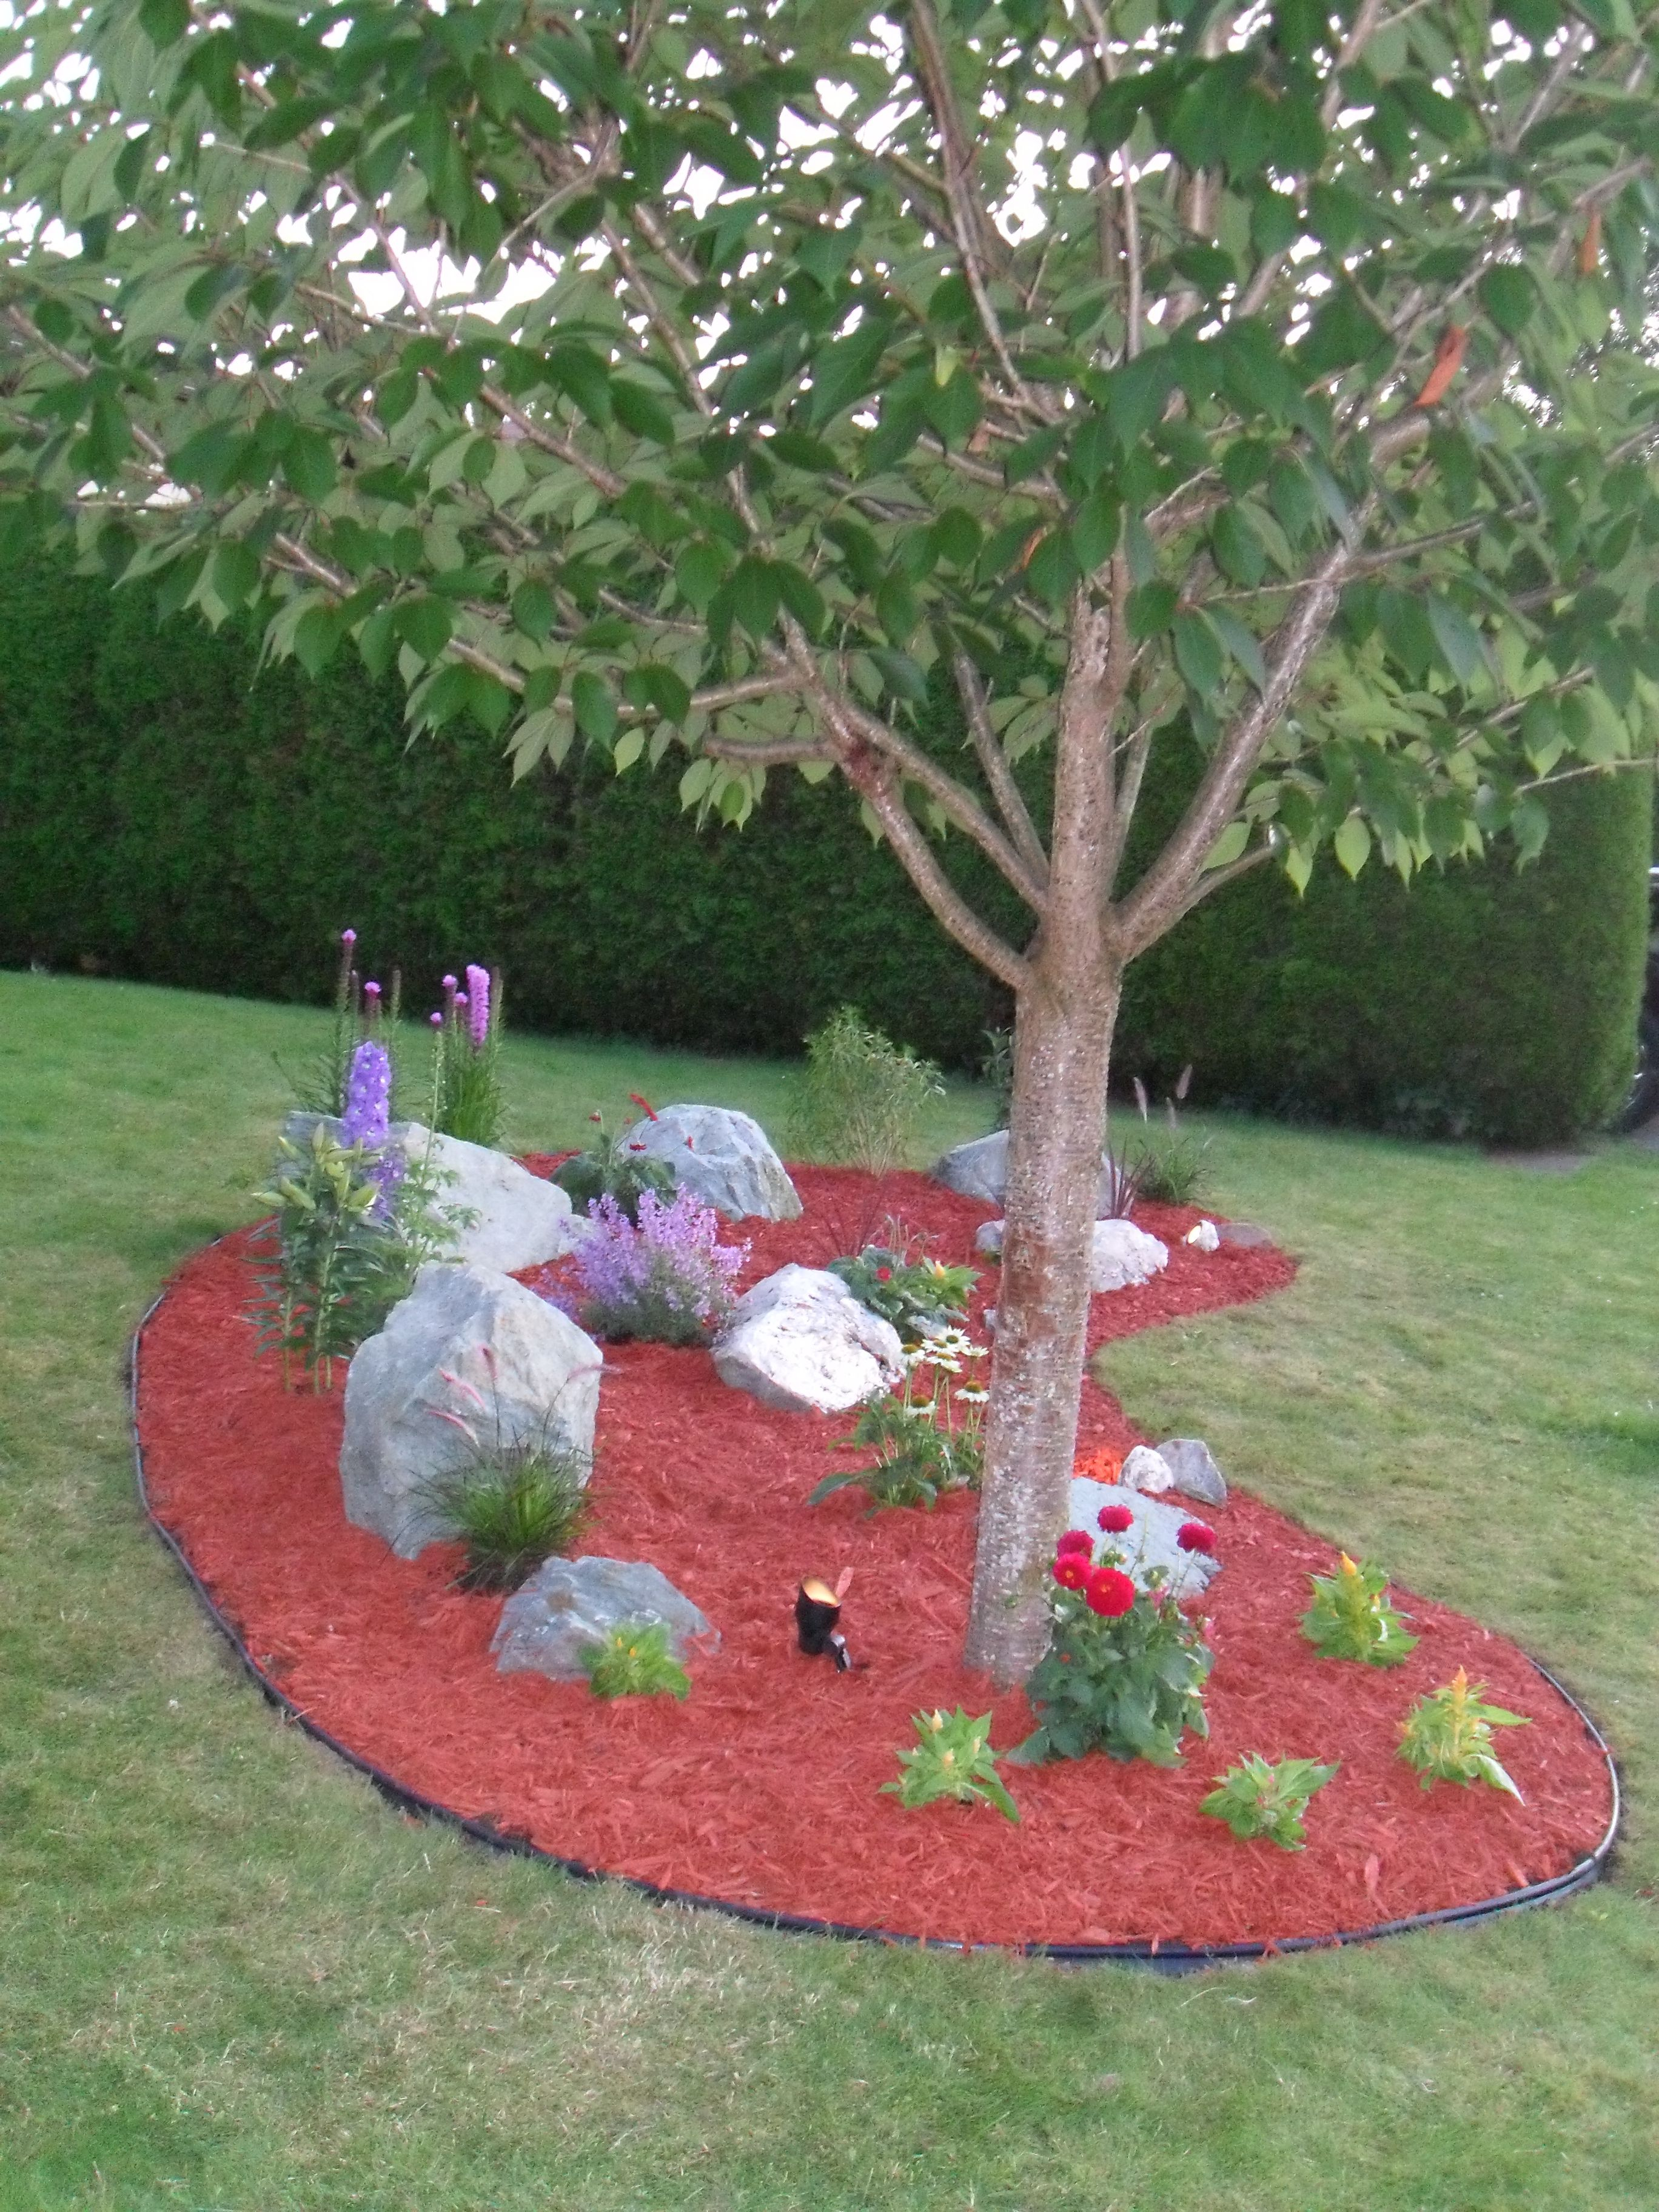 Easy DIY Landscaping - Build a Rock Garden | Gossip news, Rock and ...